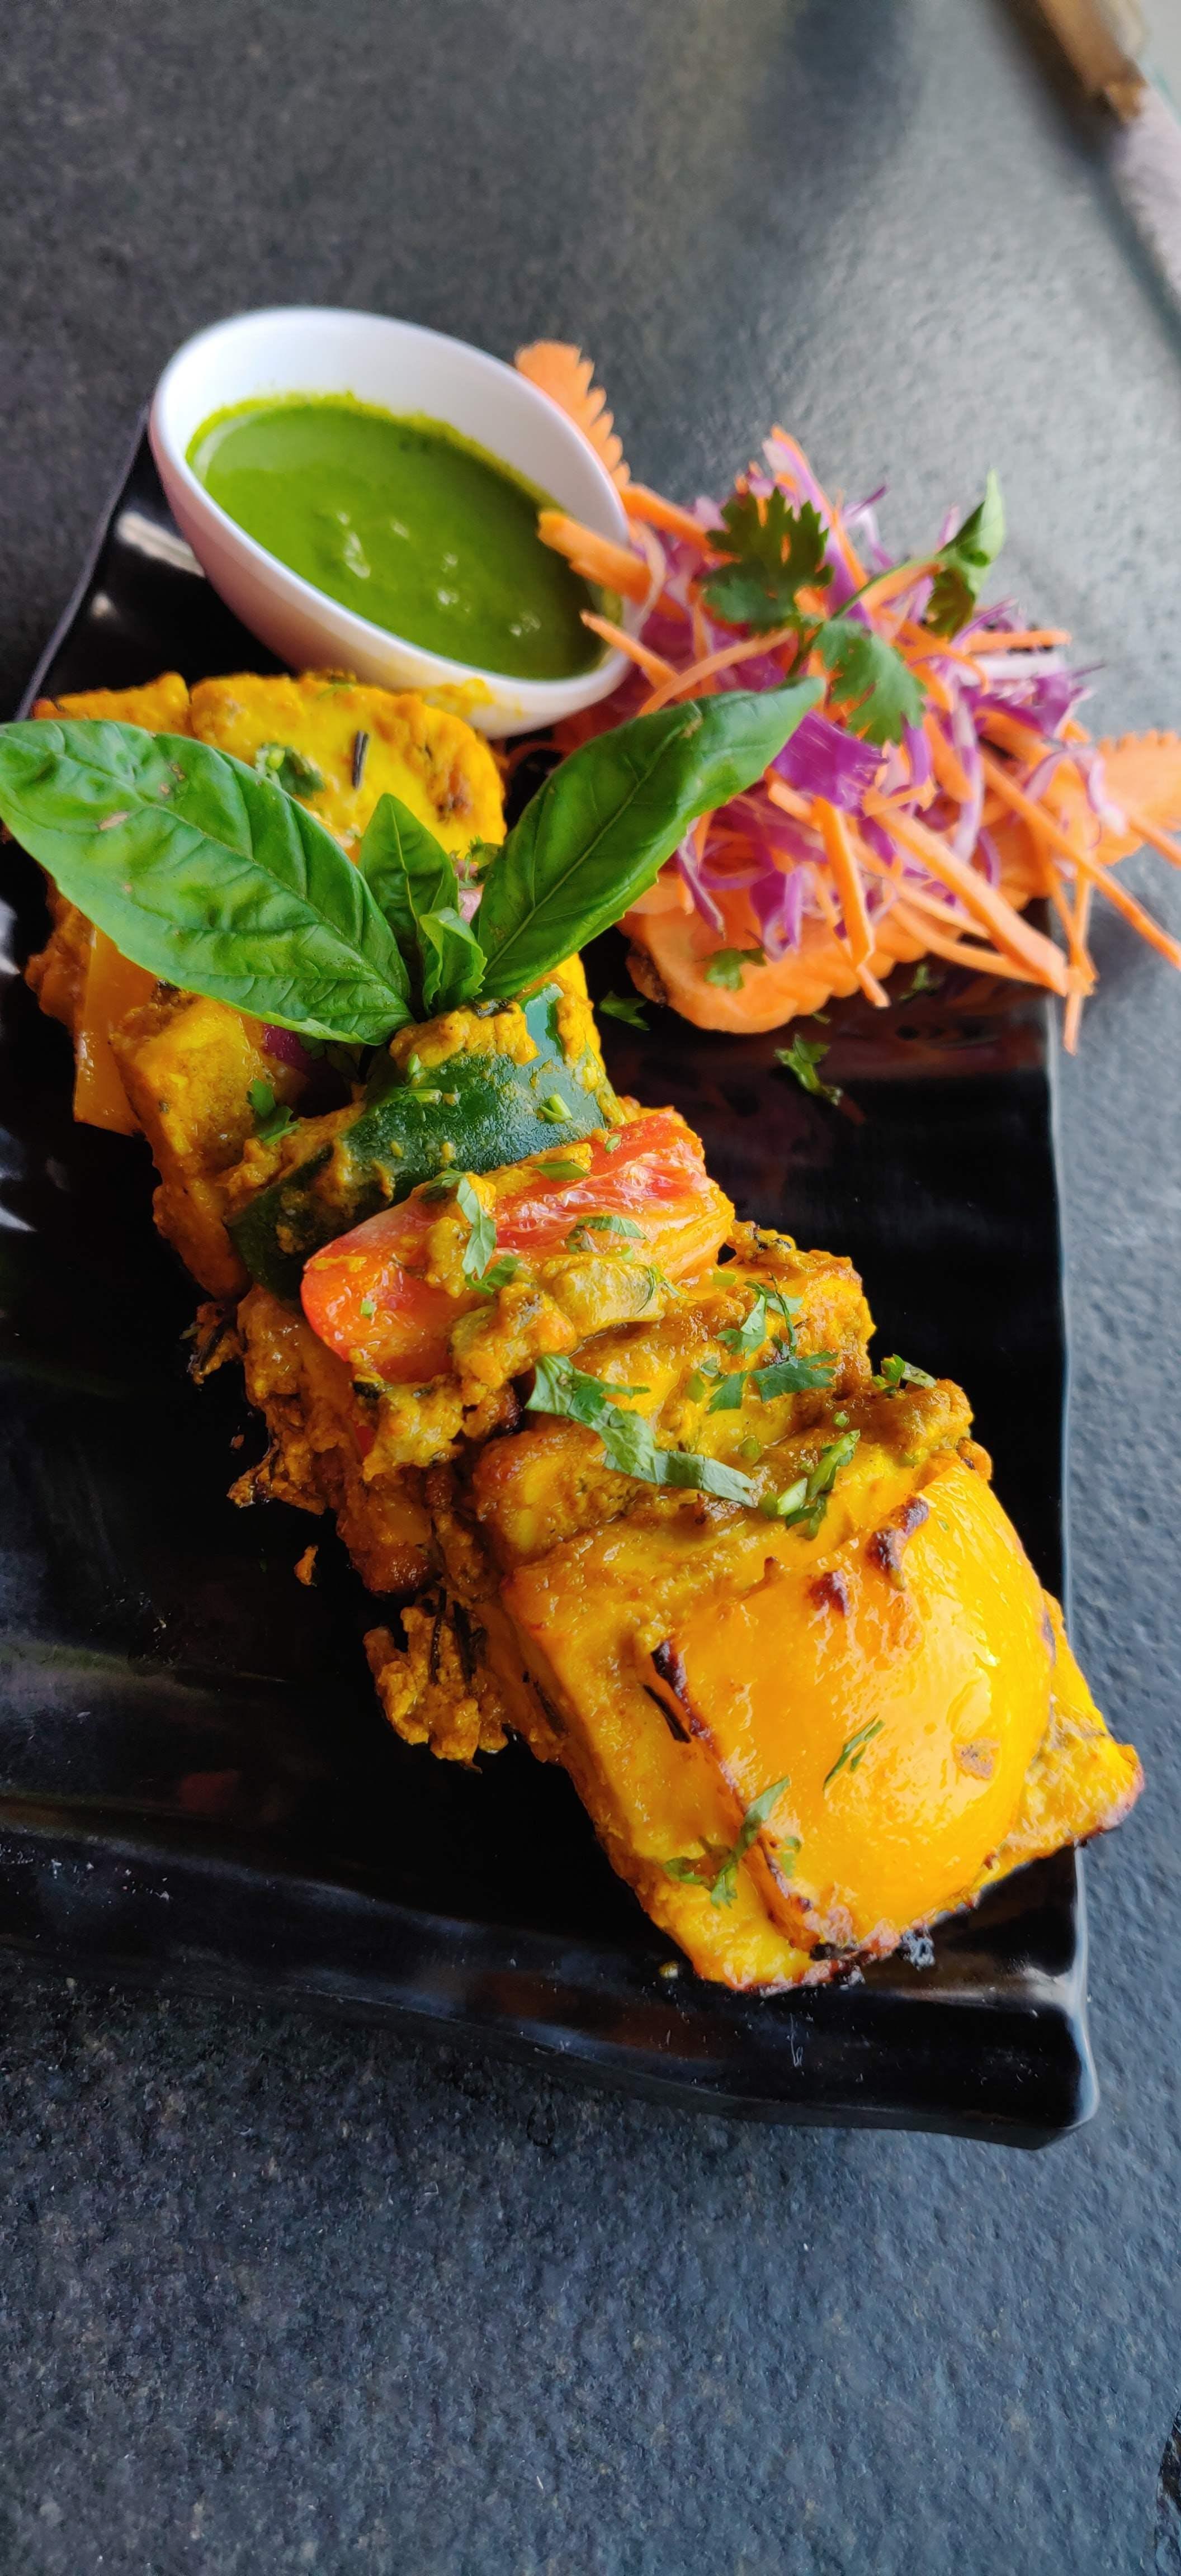 Dish,Food,Cuisine,Ingredient,Recipe,Produce,Vegan nutrition,Meat,Thai food,Curry